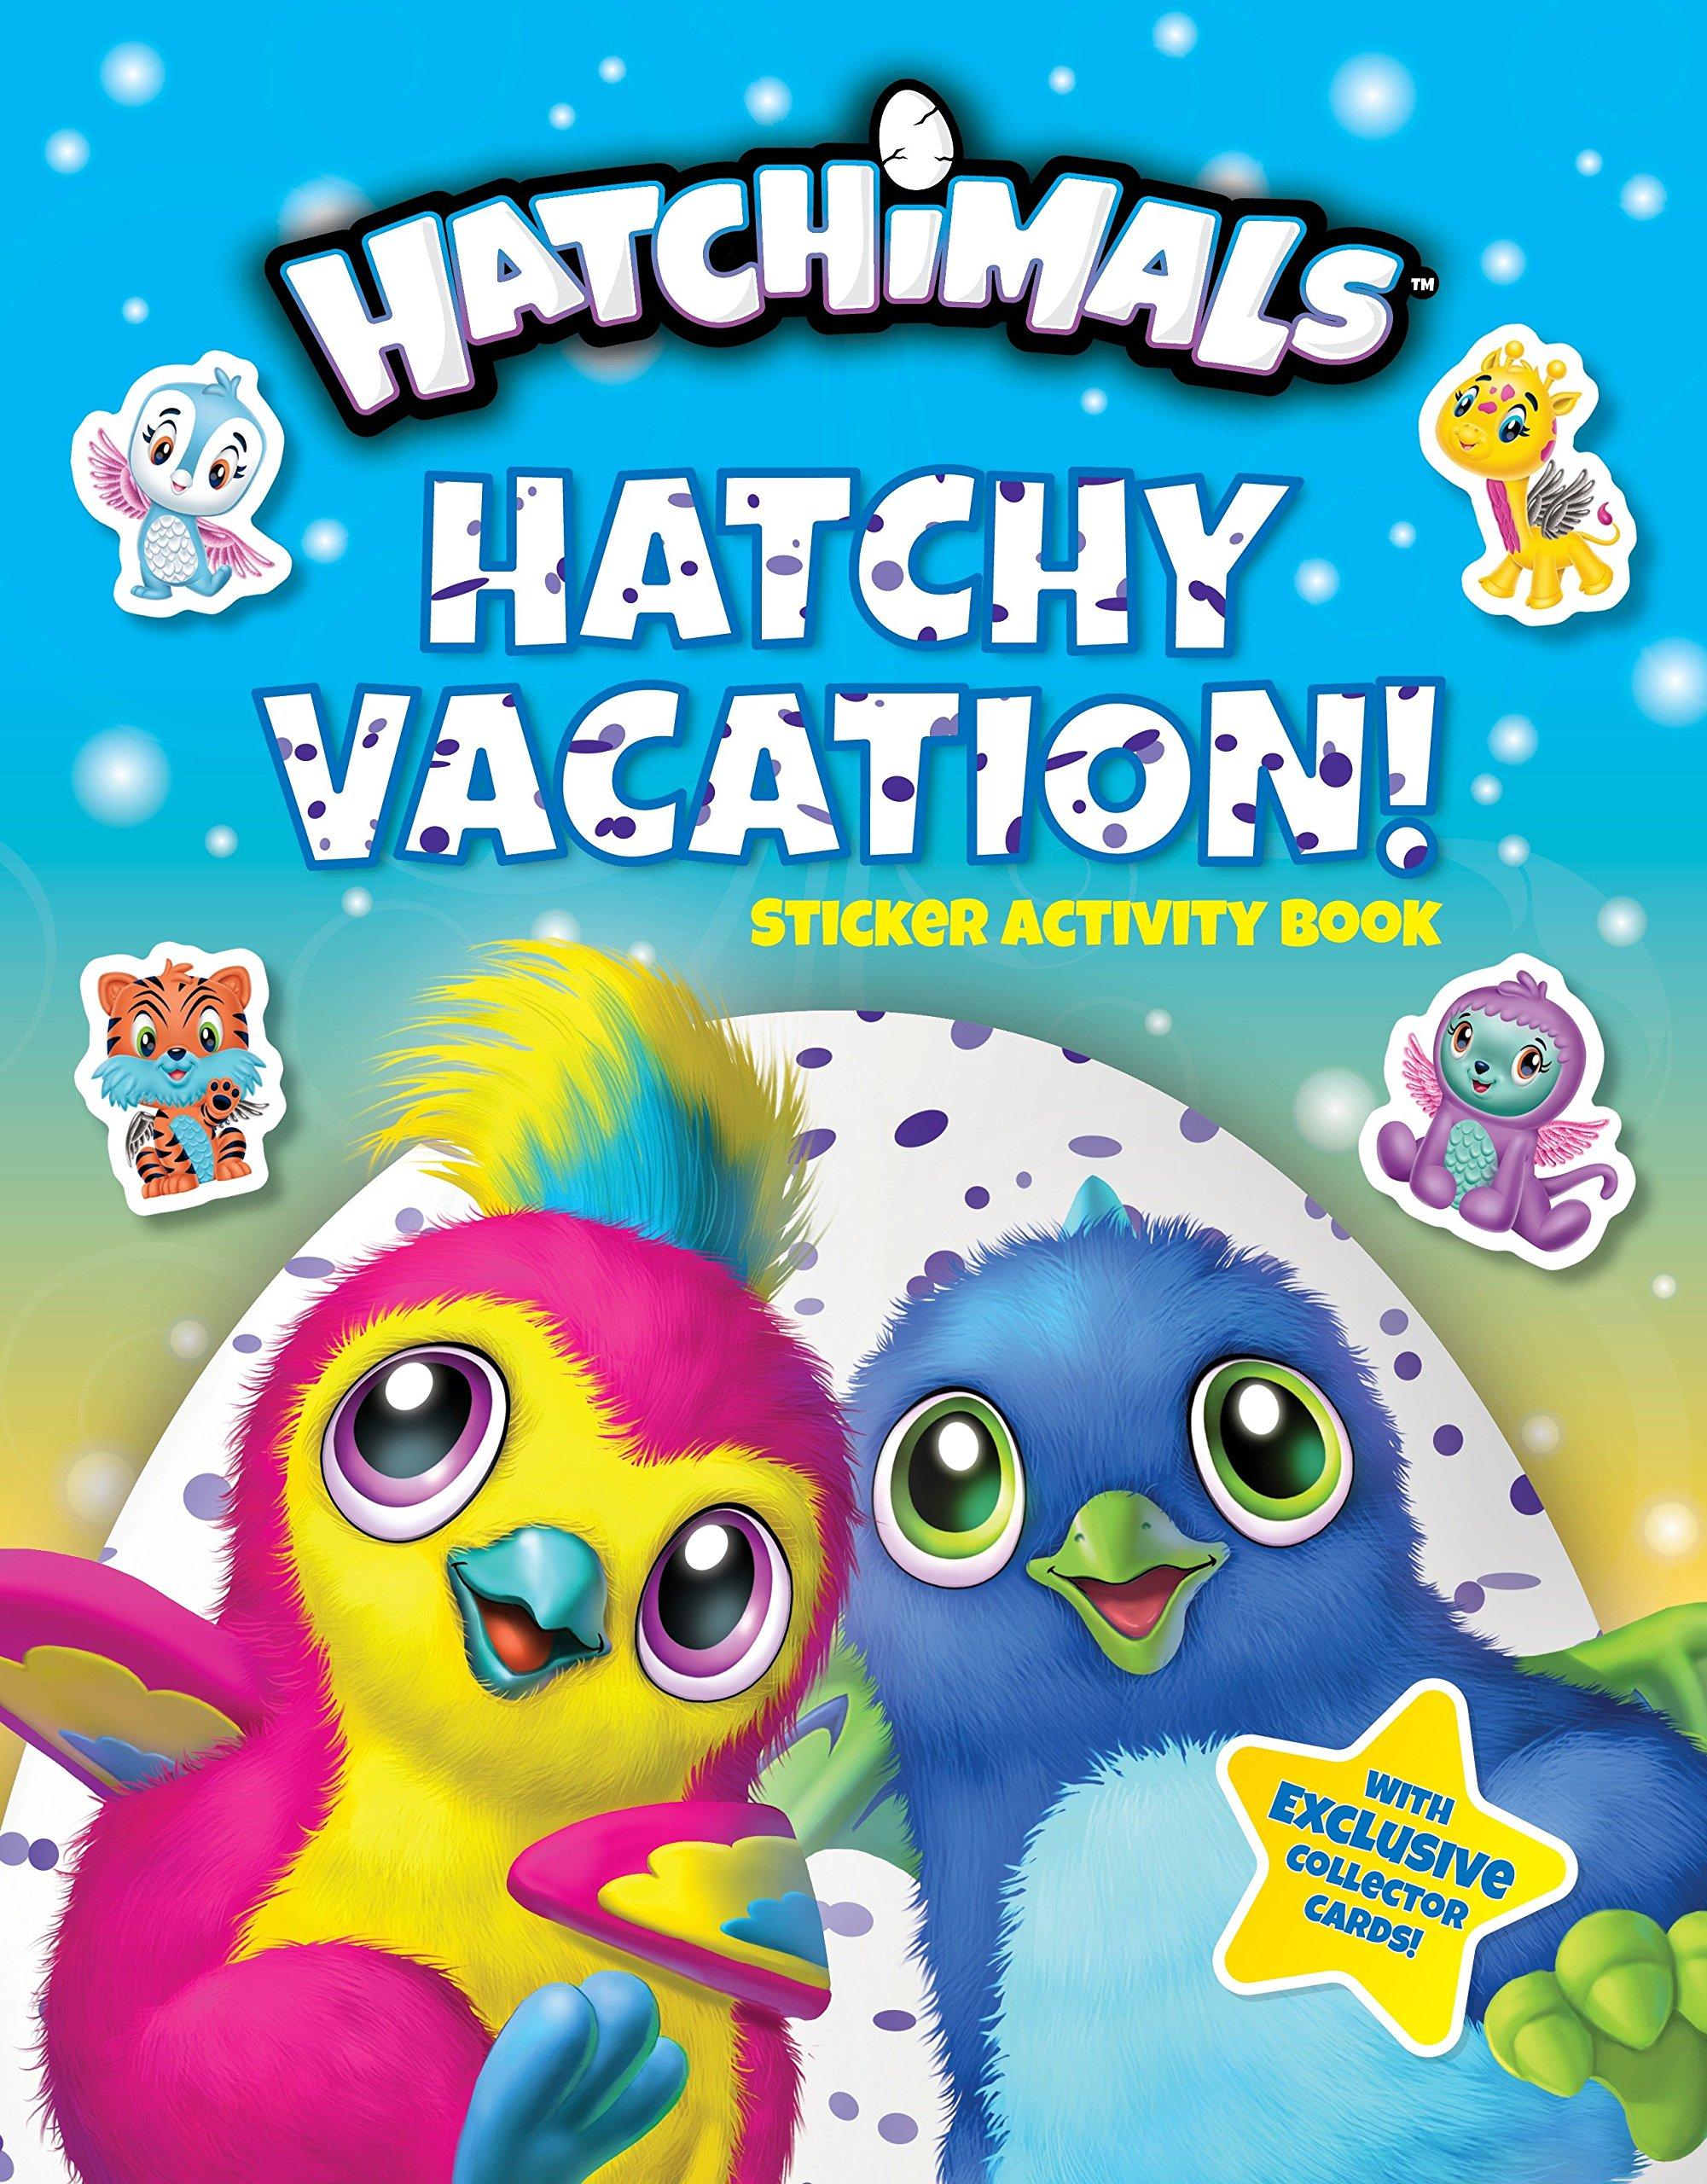 Hatchy Vacation!